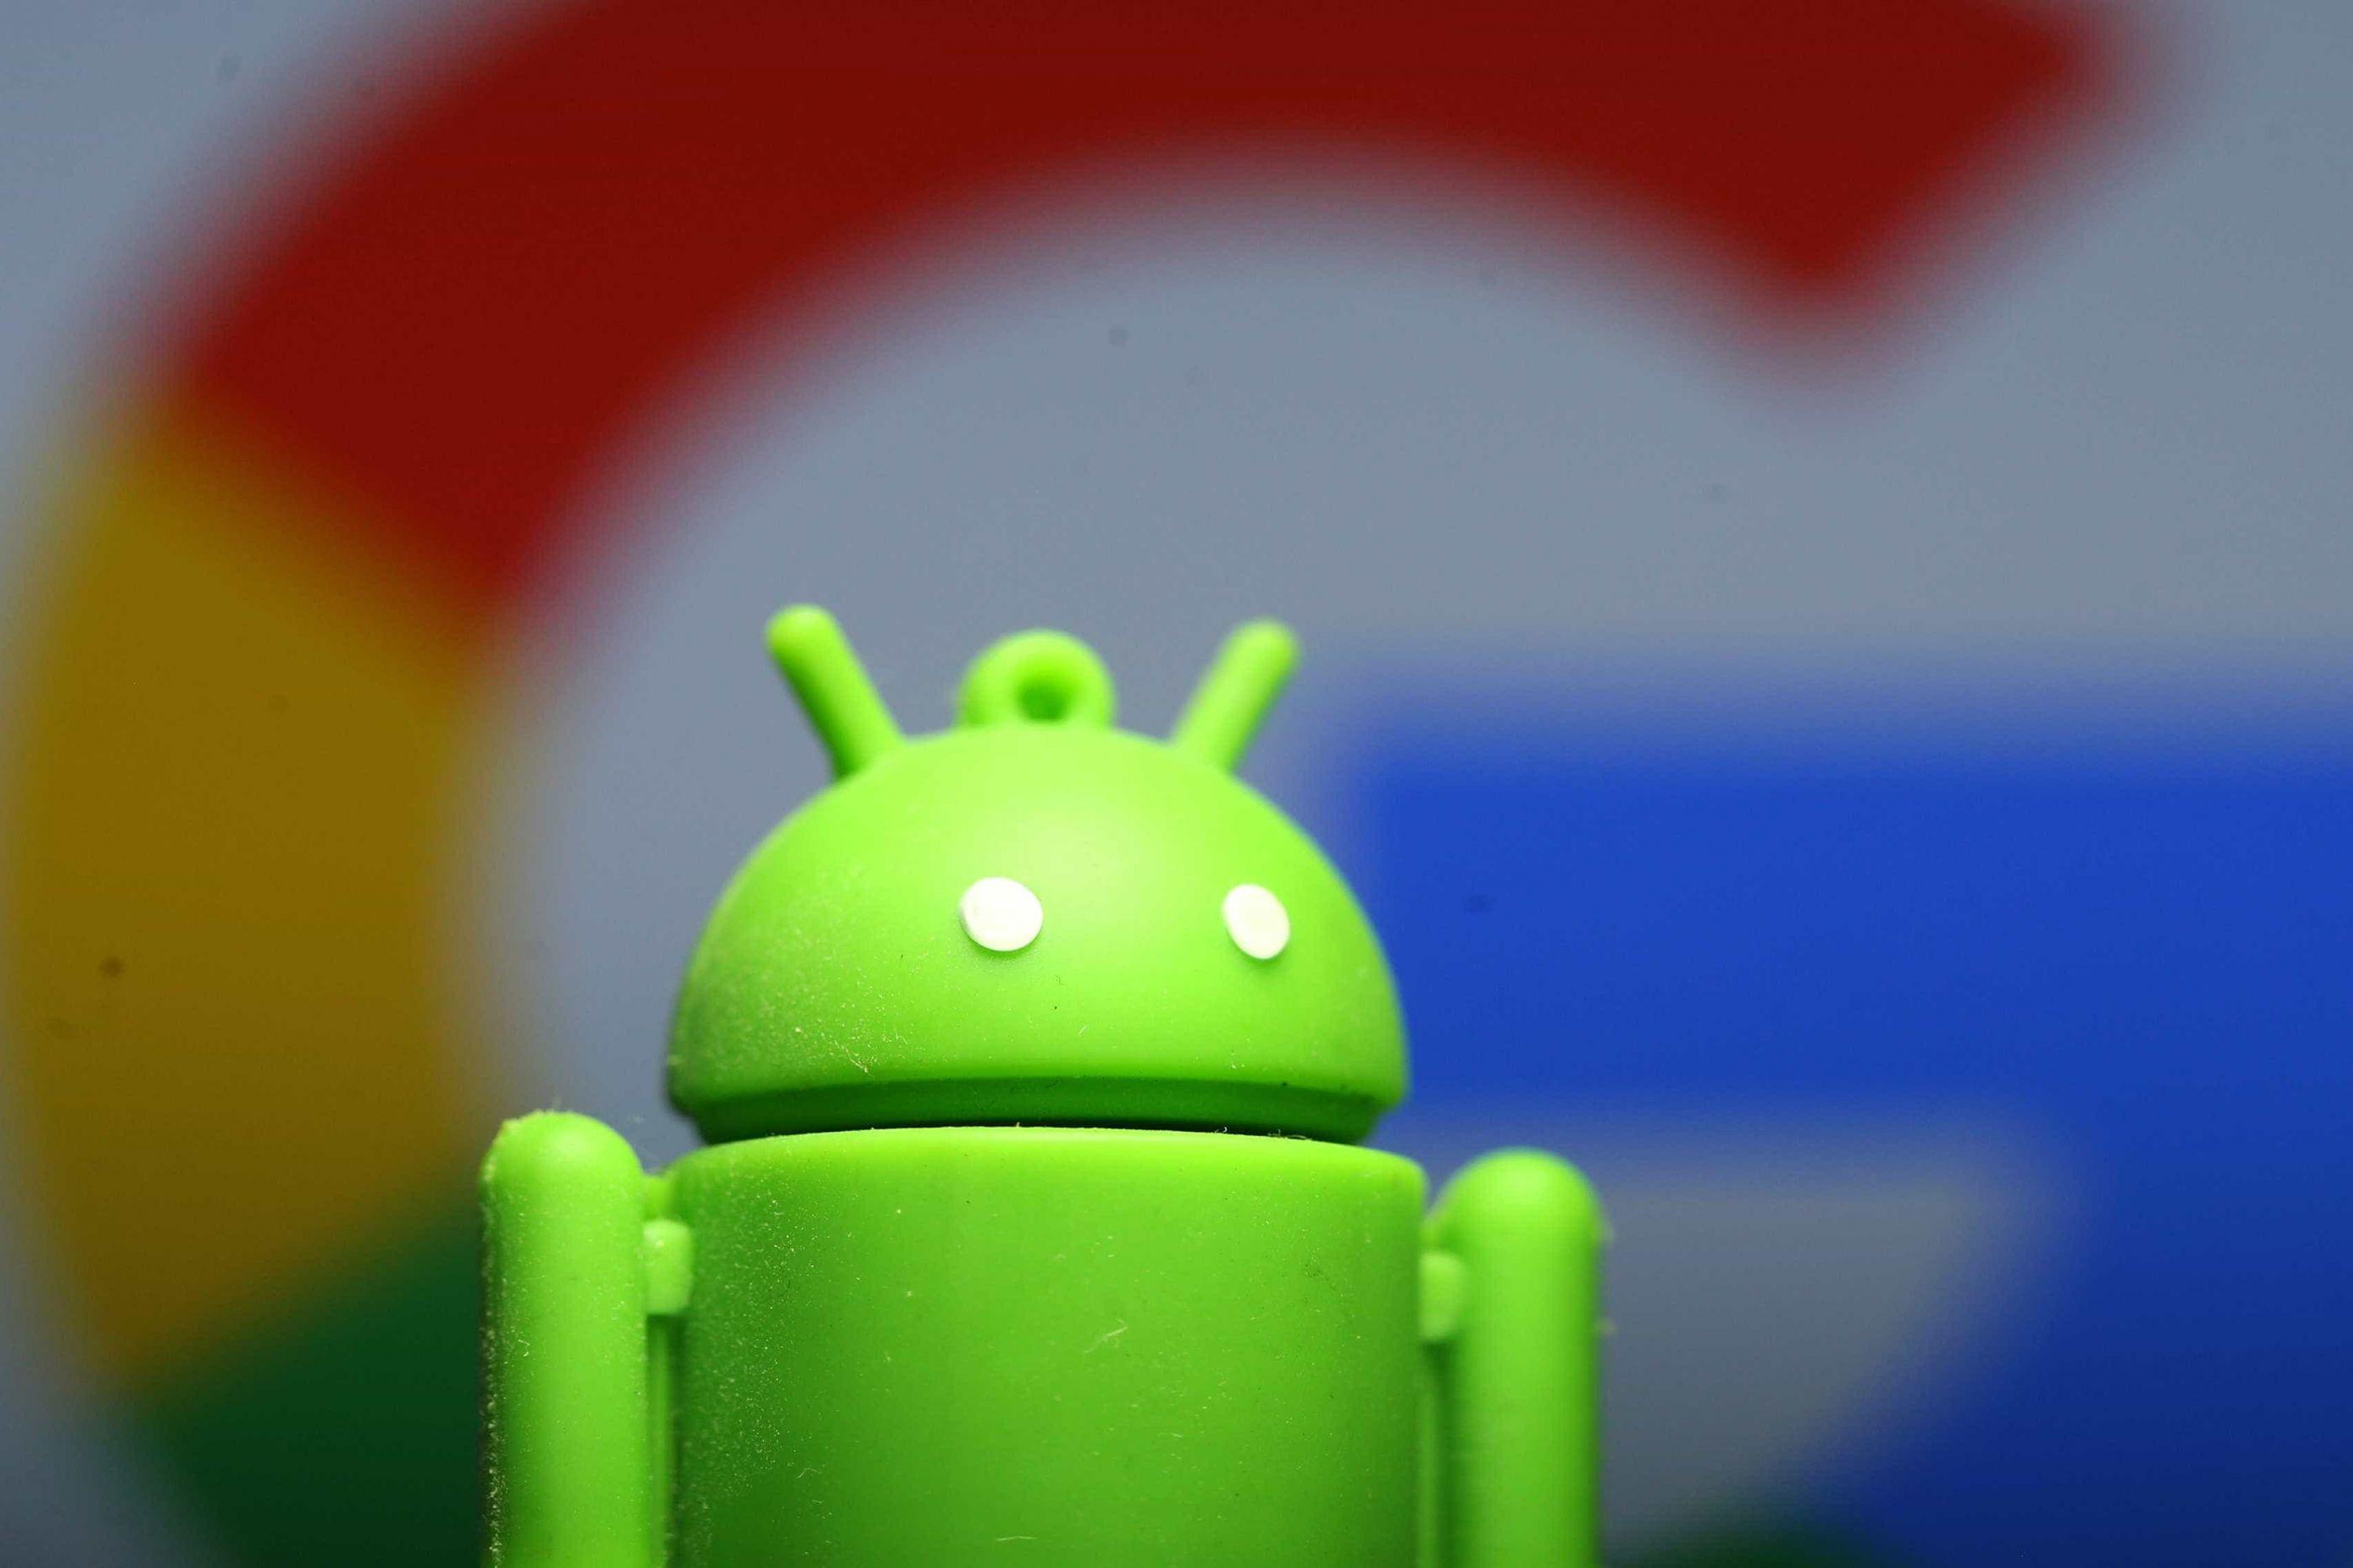 Projeto piloto da Google pretende formar três mil portugueses